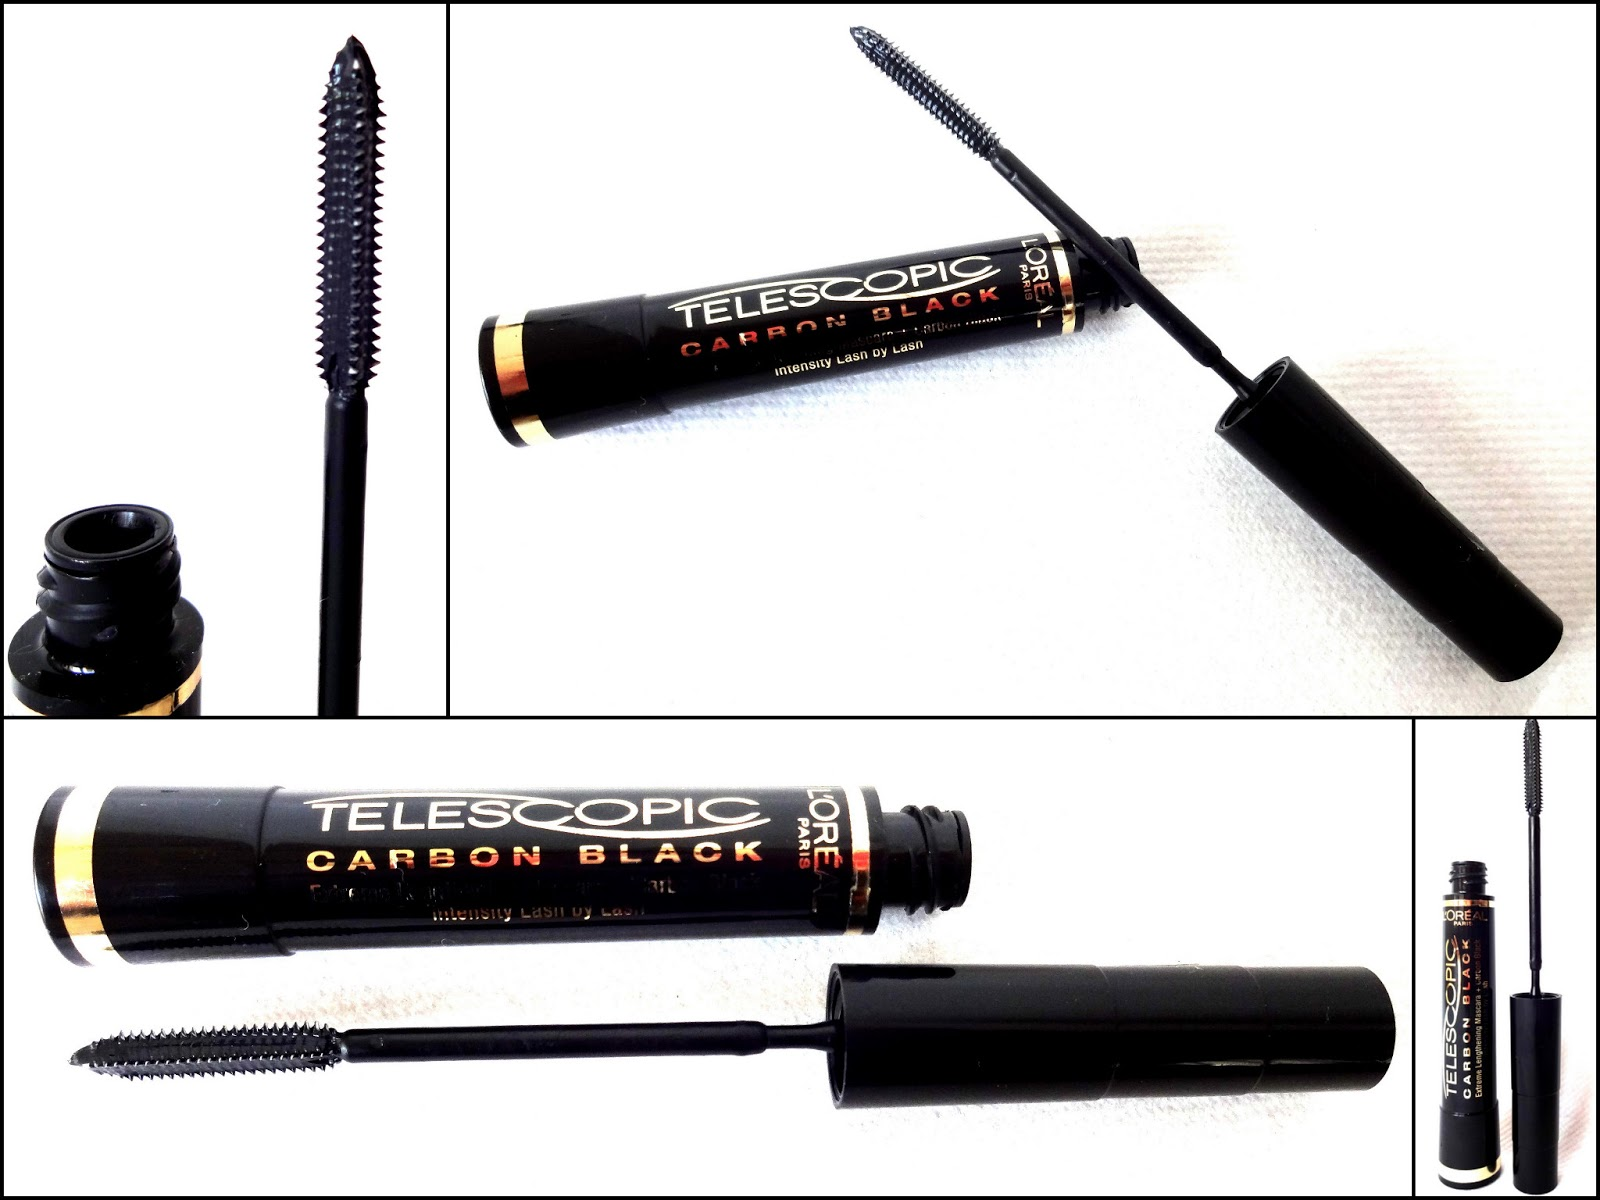 Tragebilder des L'Oréal Mascara Primers und der L'Oréal Telescopic Carbon Black Mascara